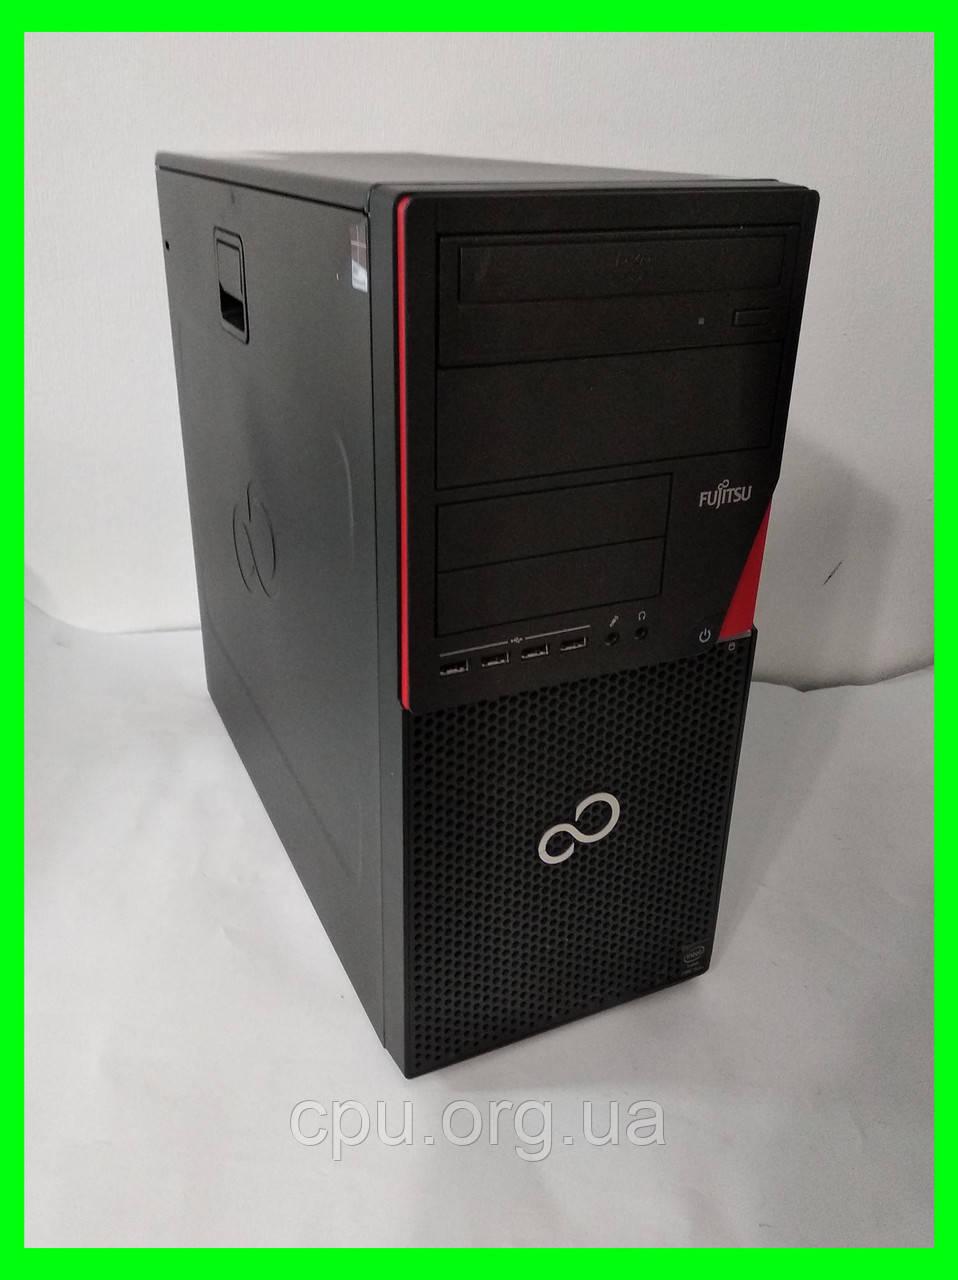 ПК Fujitsu P920 - i5-4570 4 ядра 3,20-3,60 Ghz / Windows 10 Coa